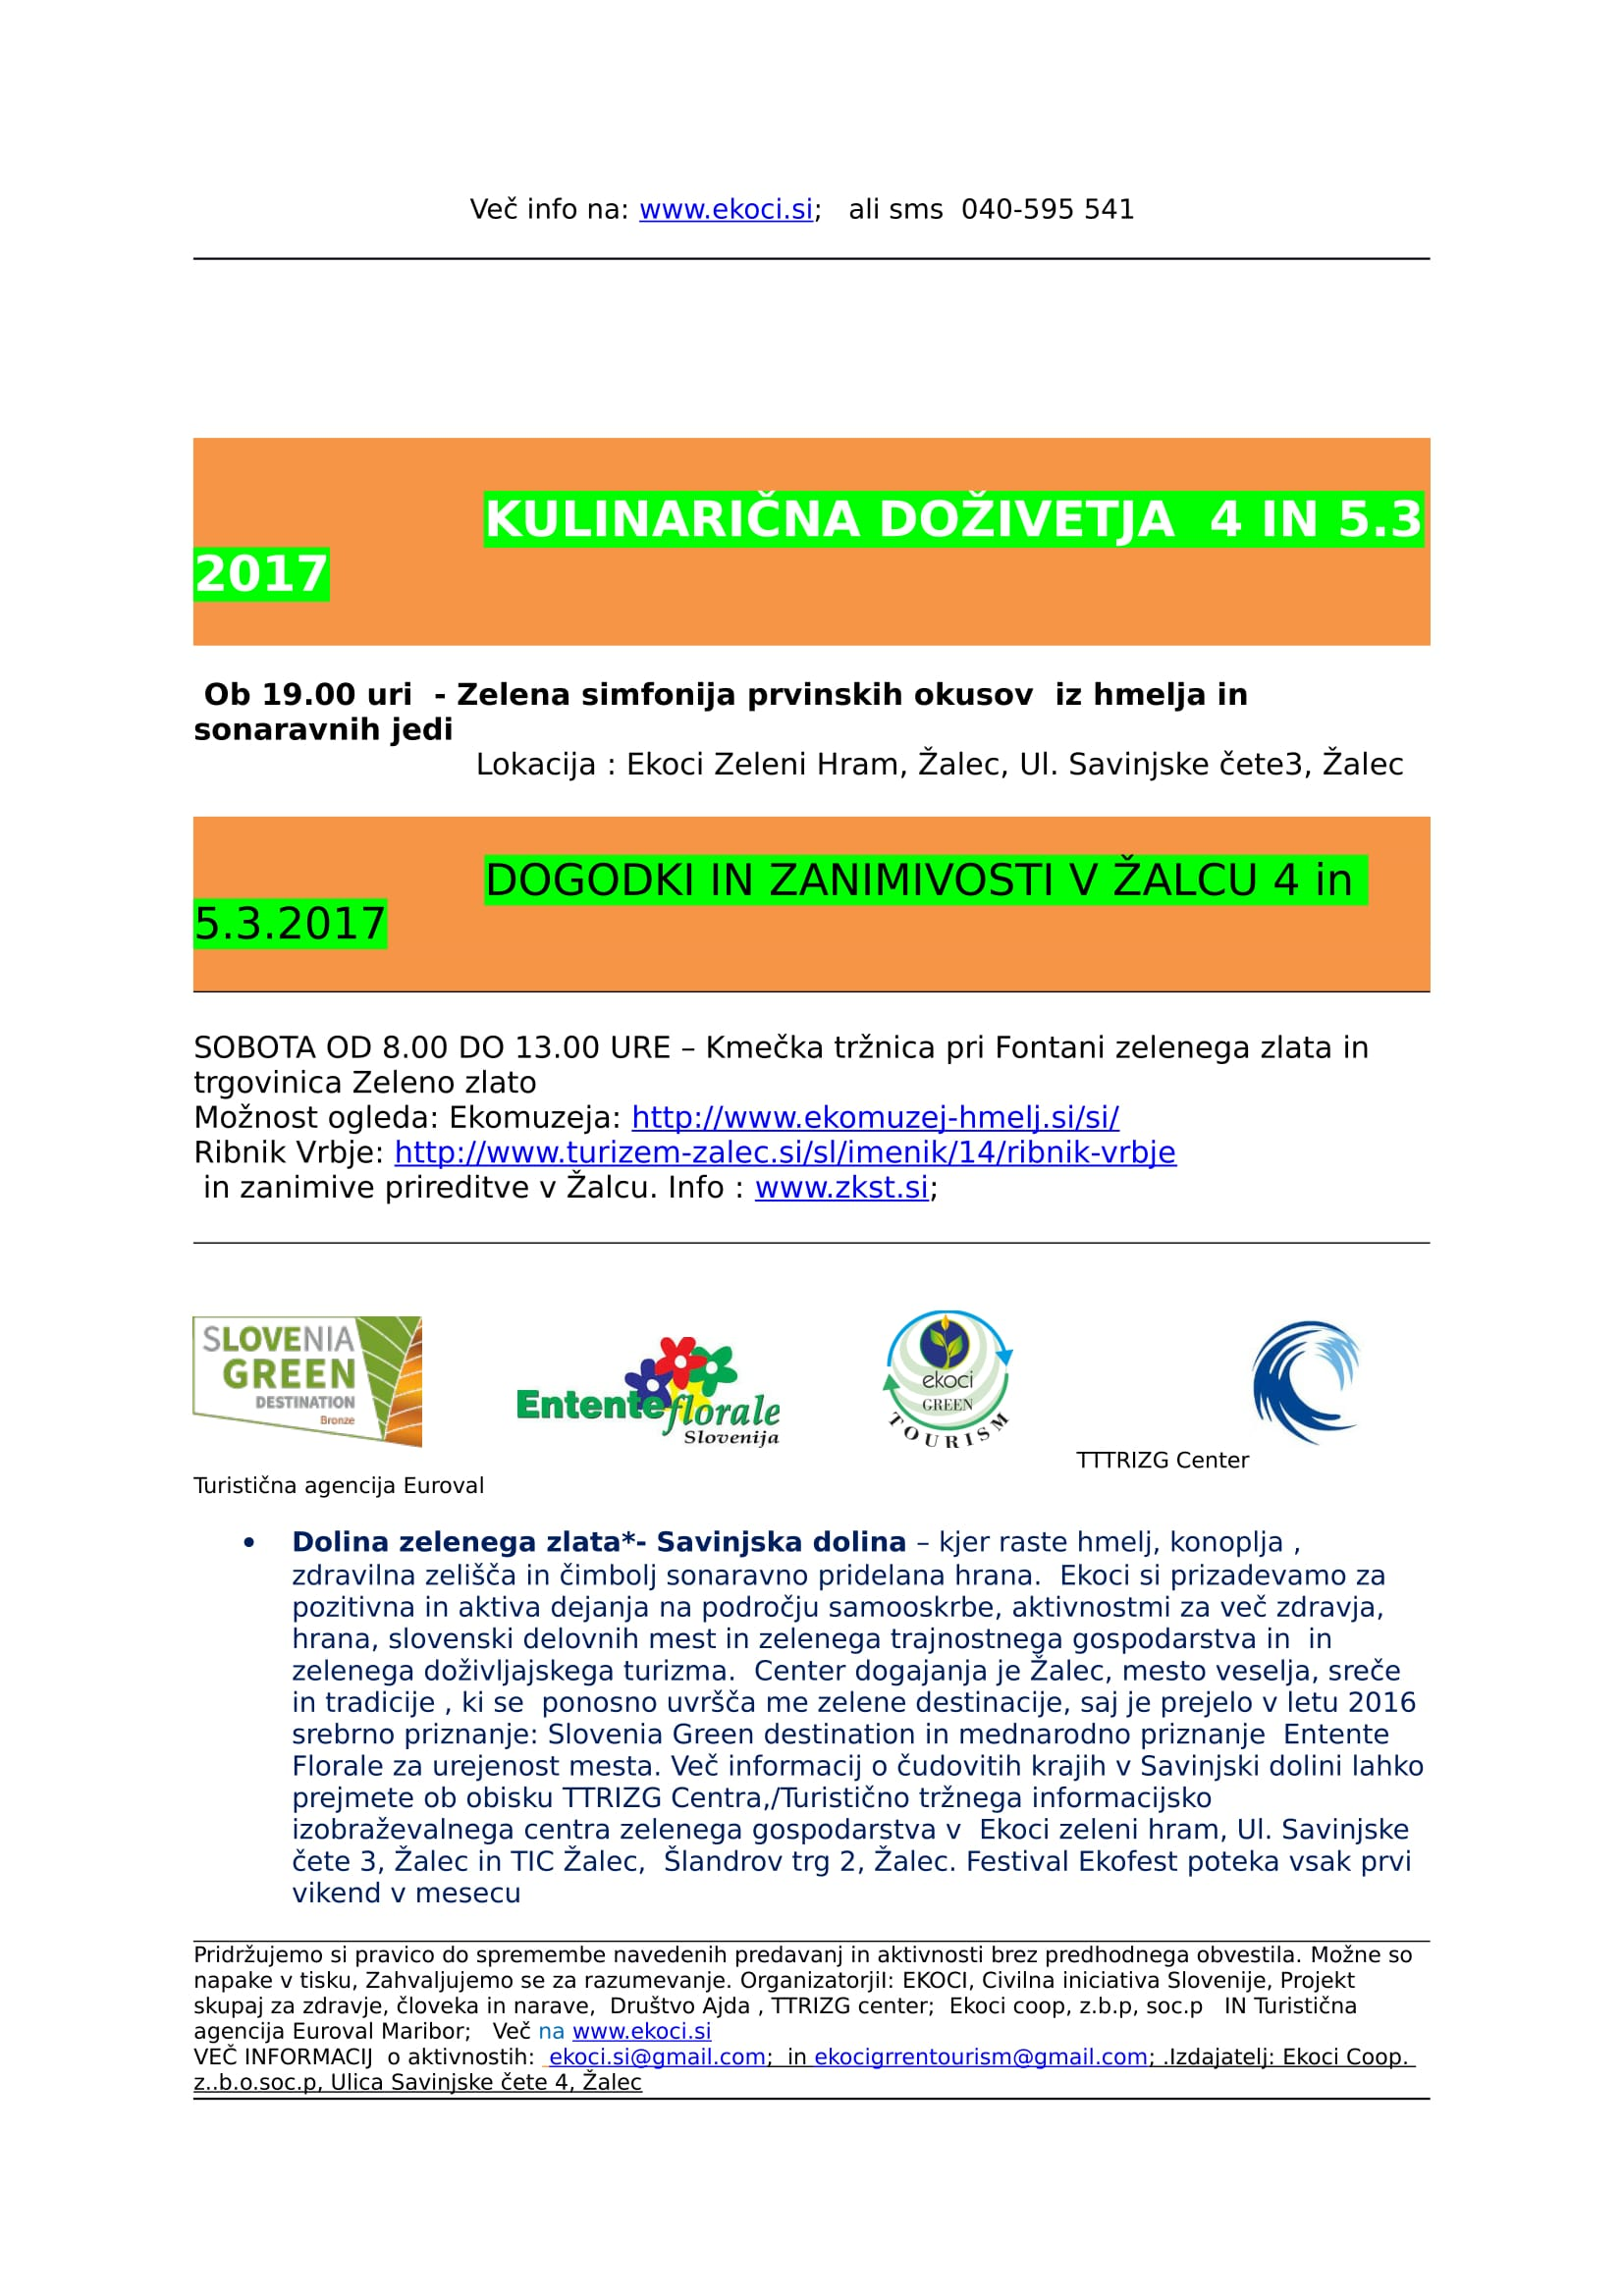 VABILO EKOFEST MAREC - festival v Savinjski dolini - dolini zelenega zlata-2